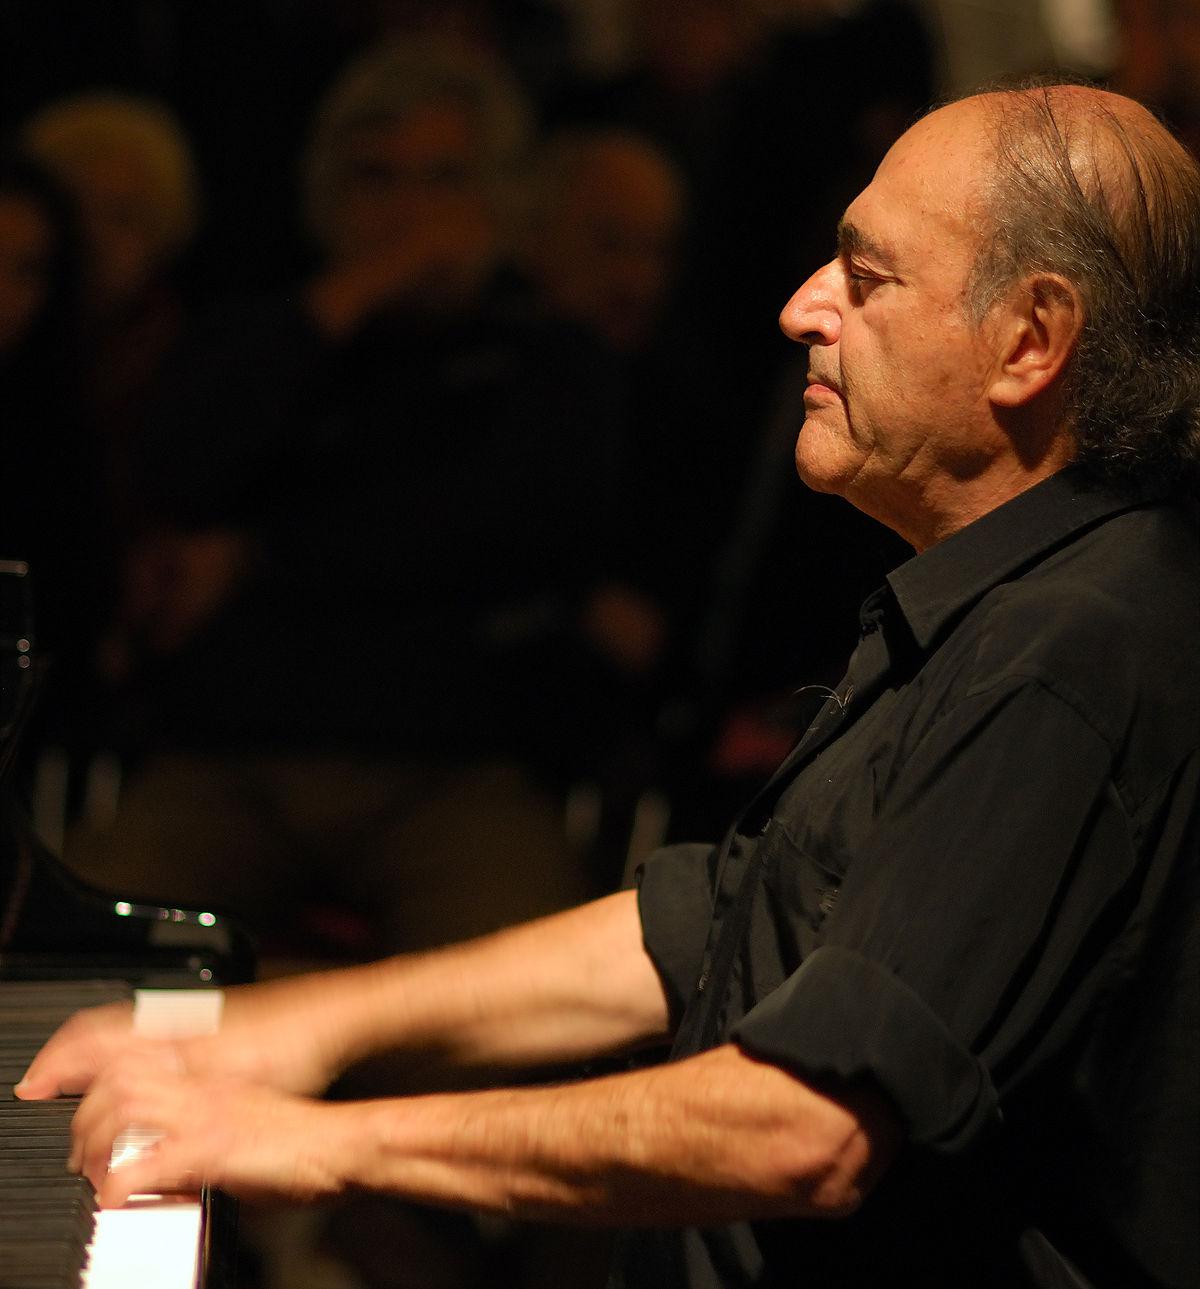 Vinaròs, mor l'artista i compositor Carles Santos